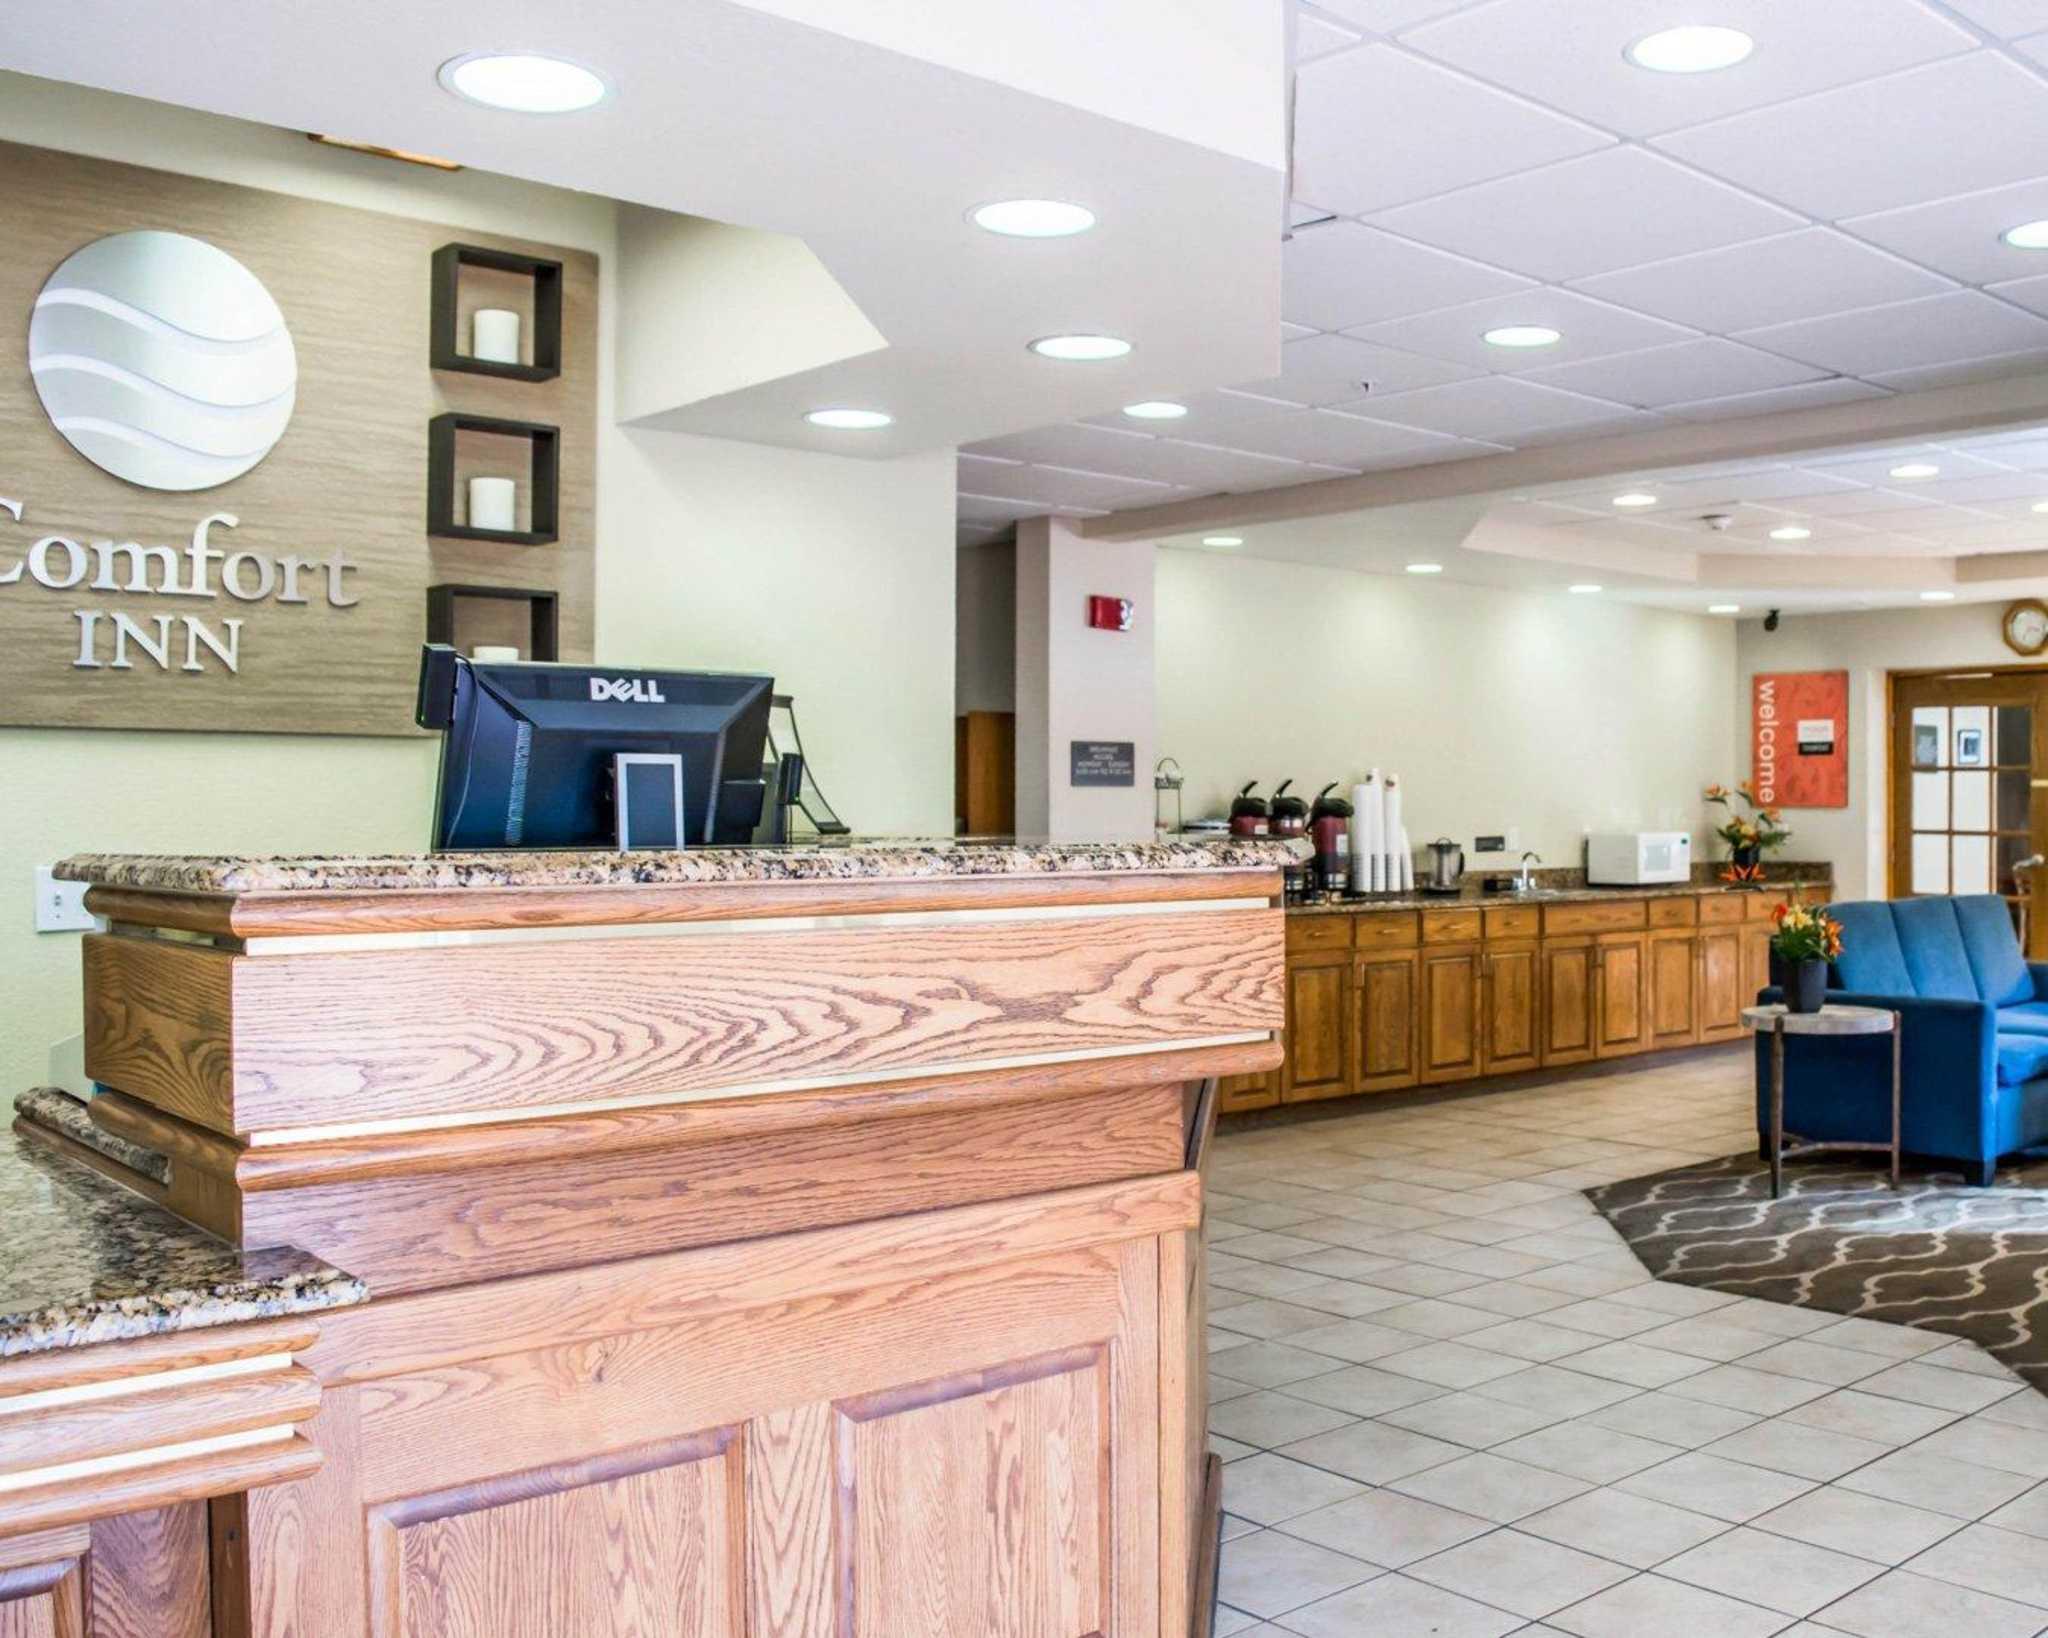 Comfort Inn Fort Myers Northeast image 16